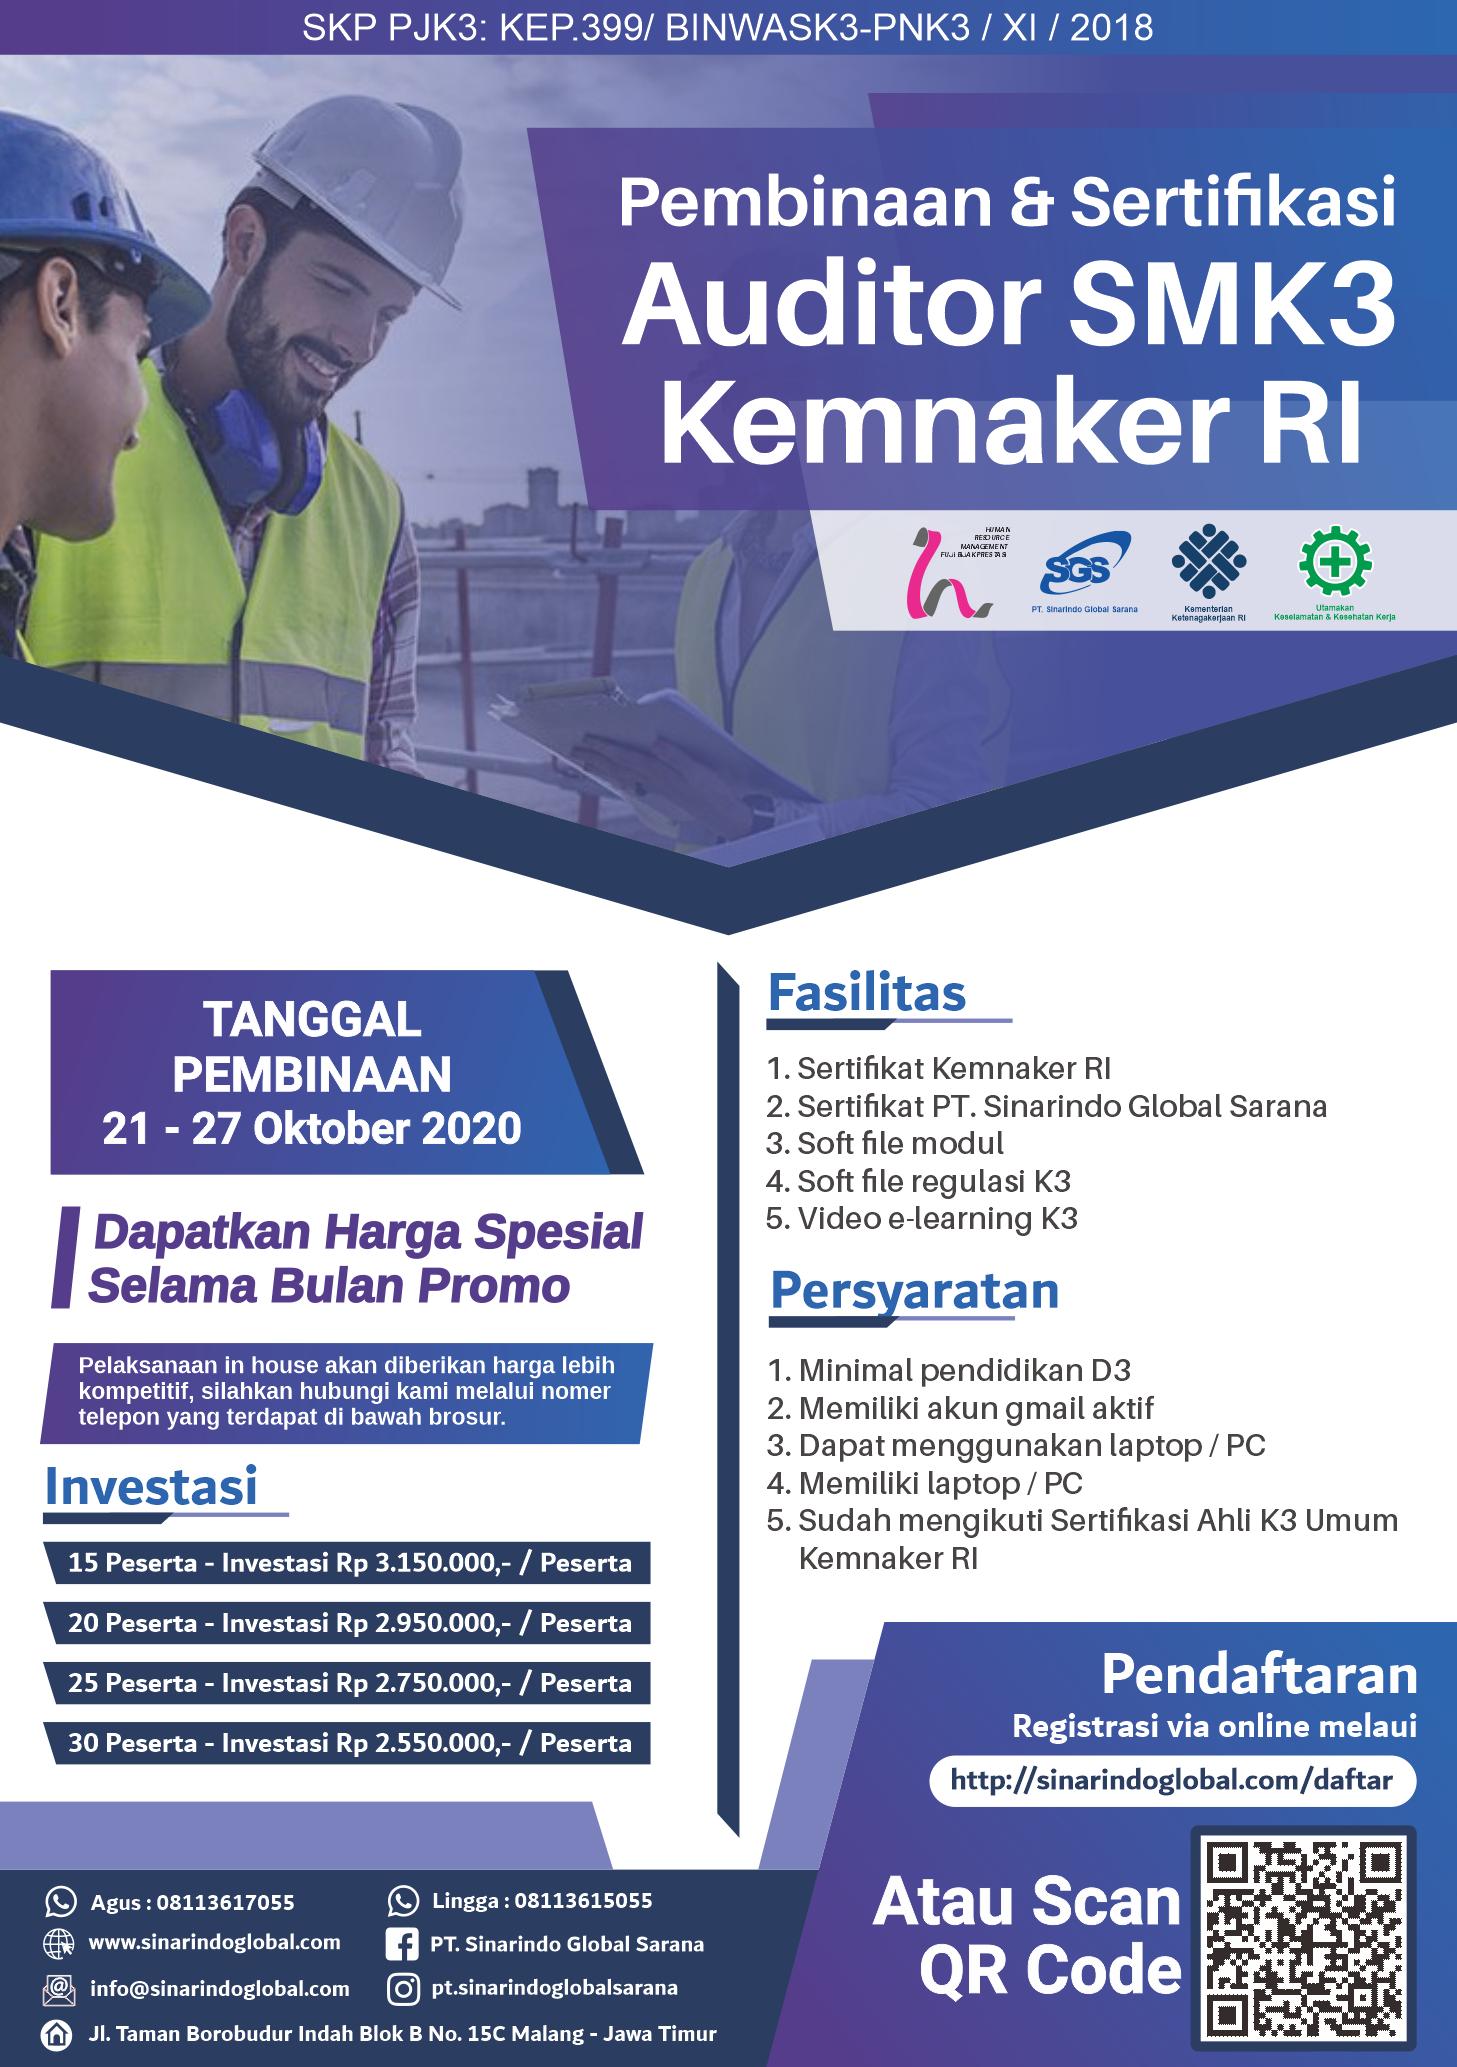 Sertifikat Auditor SMK3 ( 012_Fatoni Kurniawan )